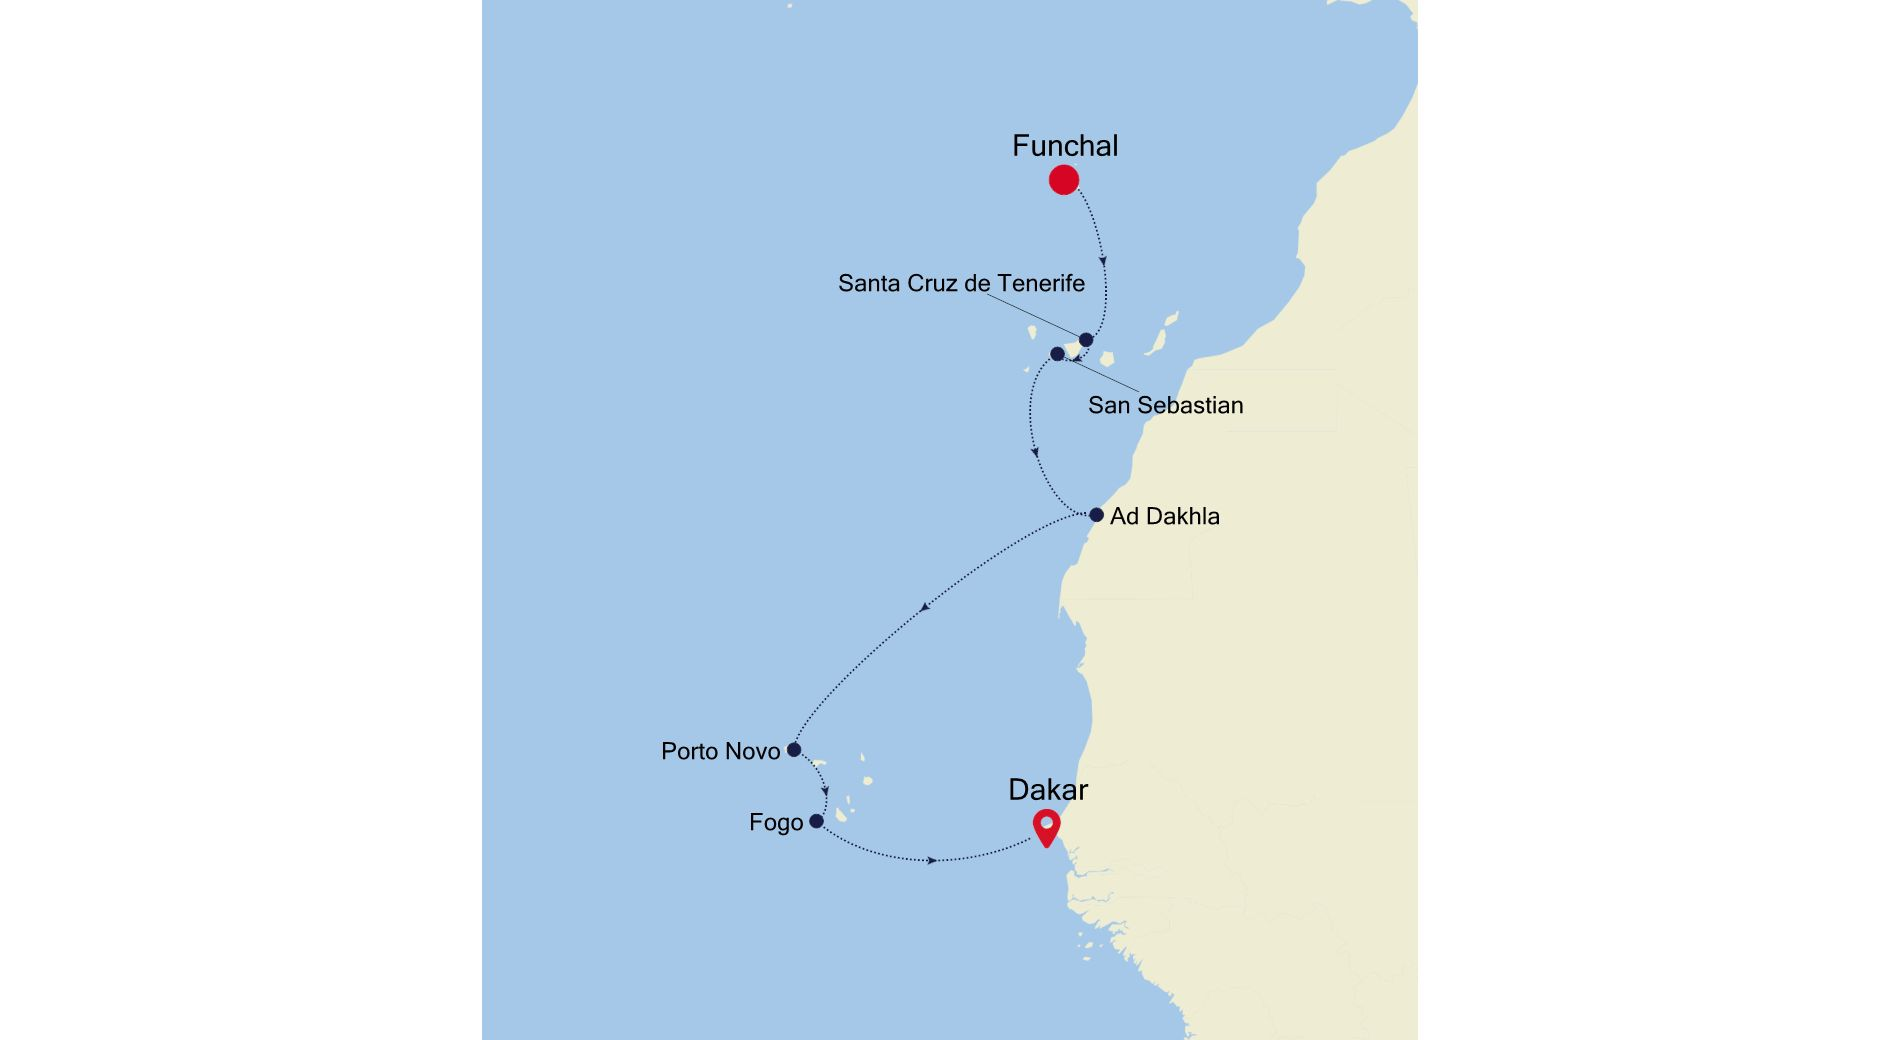 WI211020S09 - Funchal à Dakar